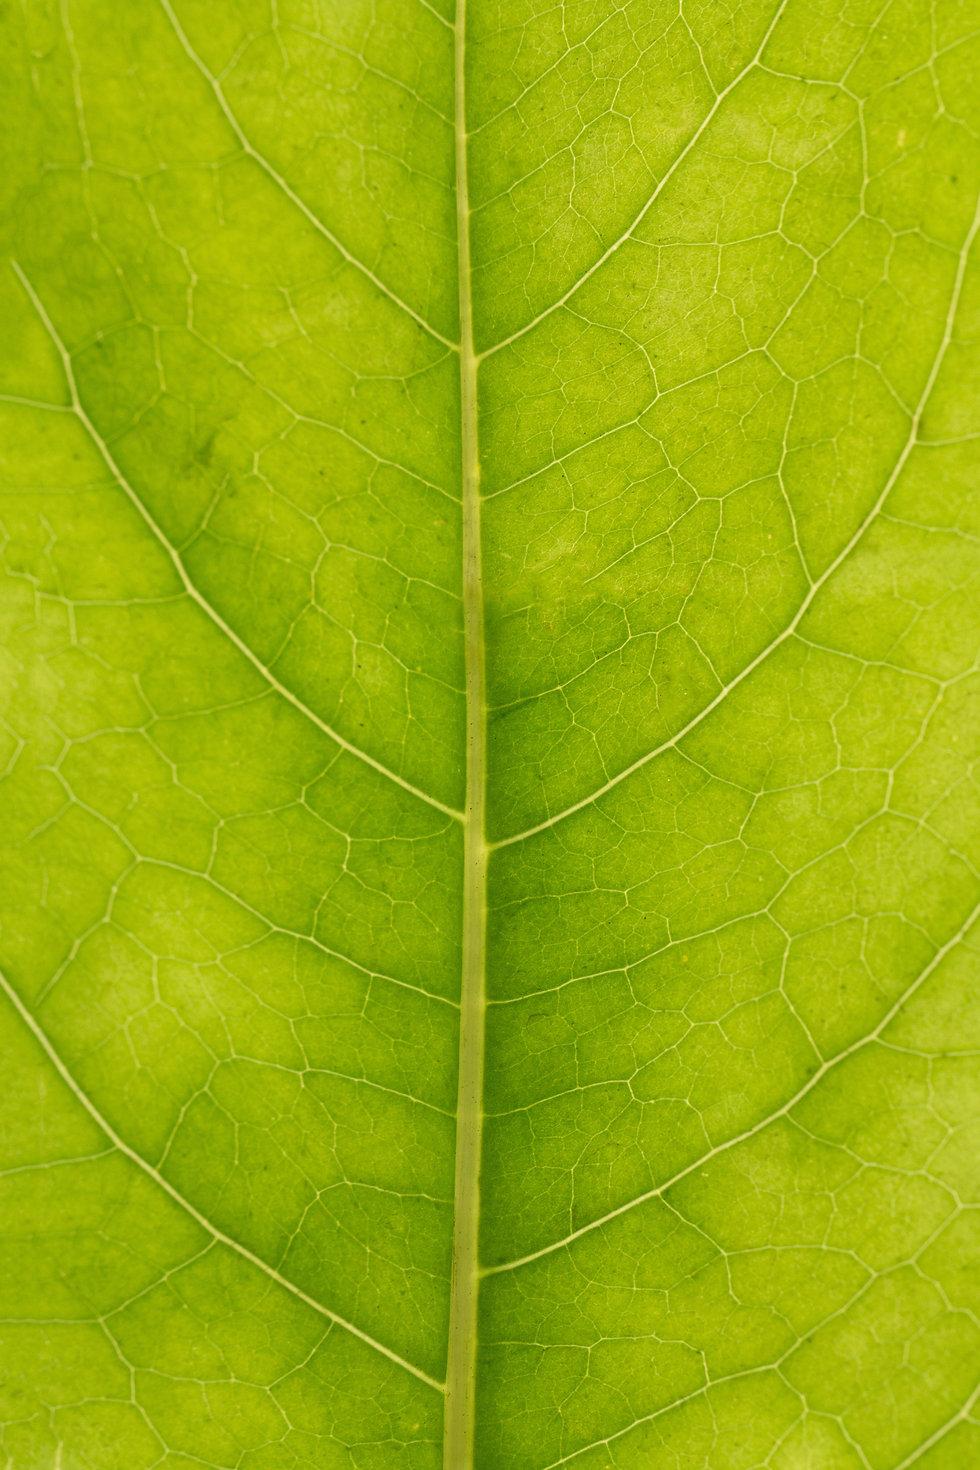 green-leaf-3531528.jpg